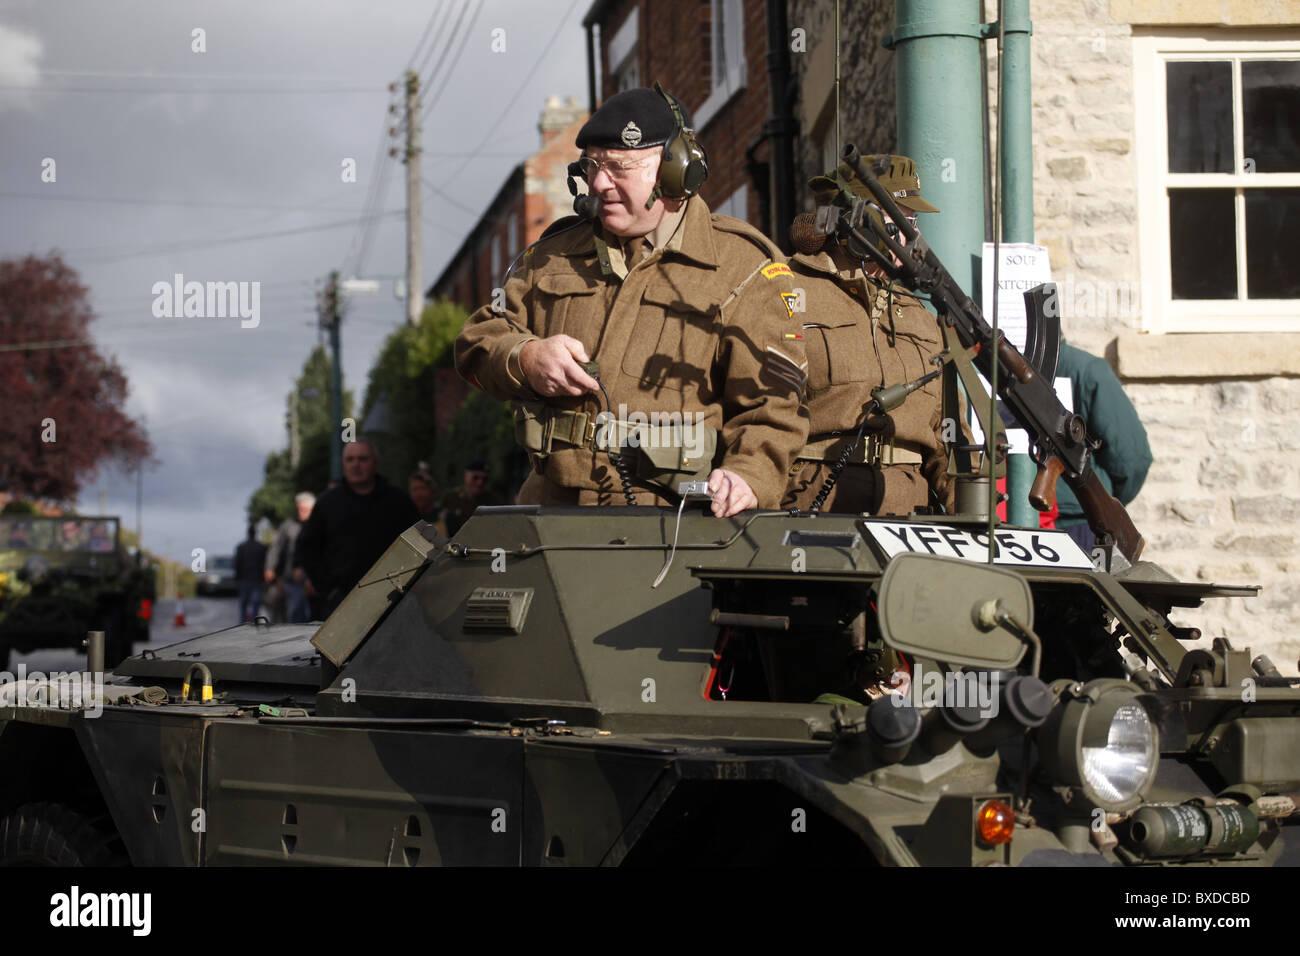 BRITISH ARMY SERGEANT PICKERING NORTH YORKSHIRE PICKERING NORTH YORKSHIRE PICKERING NORTH YORKSHIRE 16 October 2010 - Stock Image